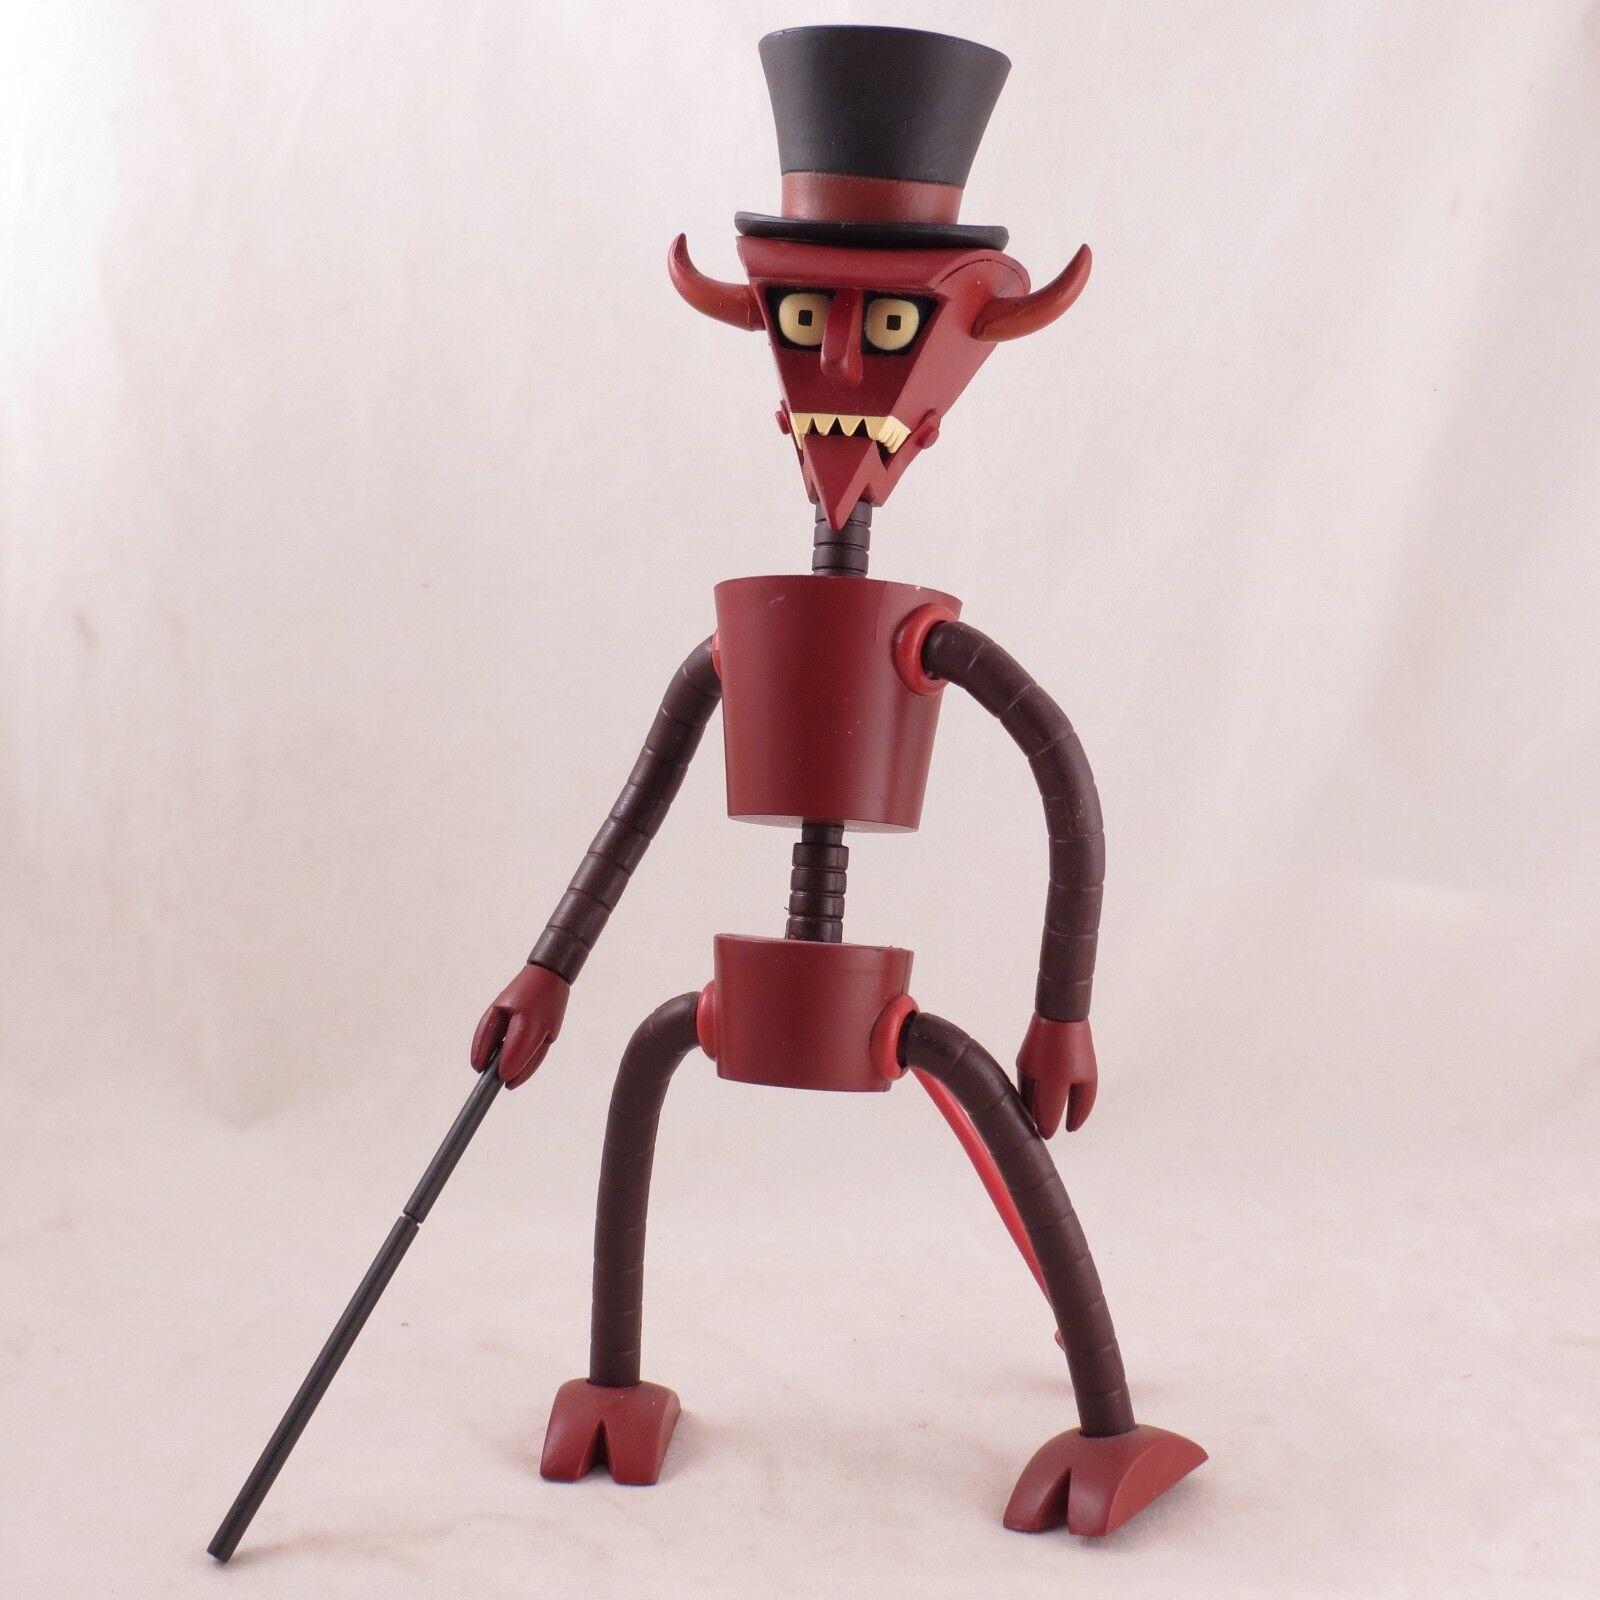 Futurama Robot Devil Build-a-bot Suelto Completo Figura de acción por Juguetenami